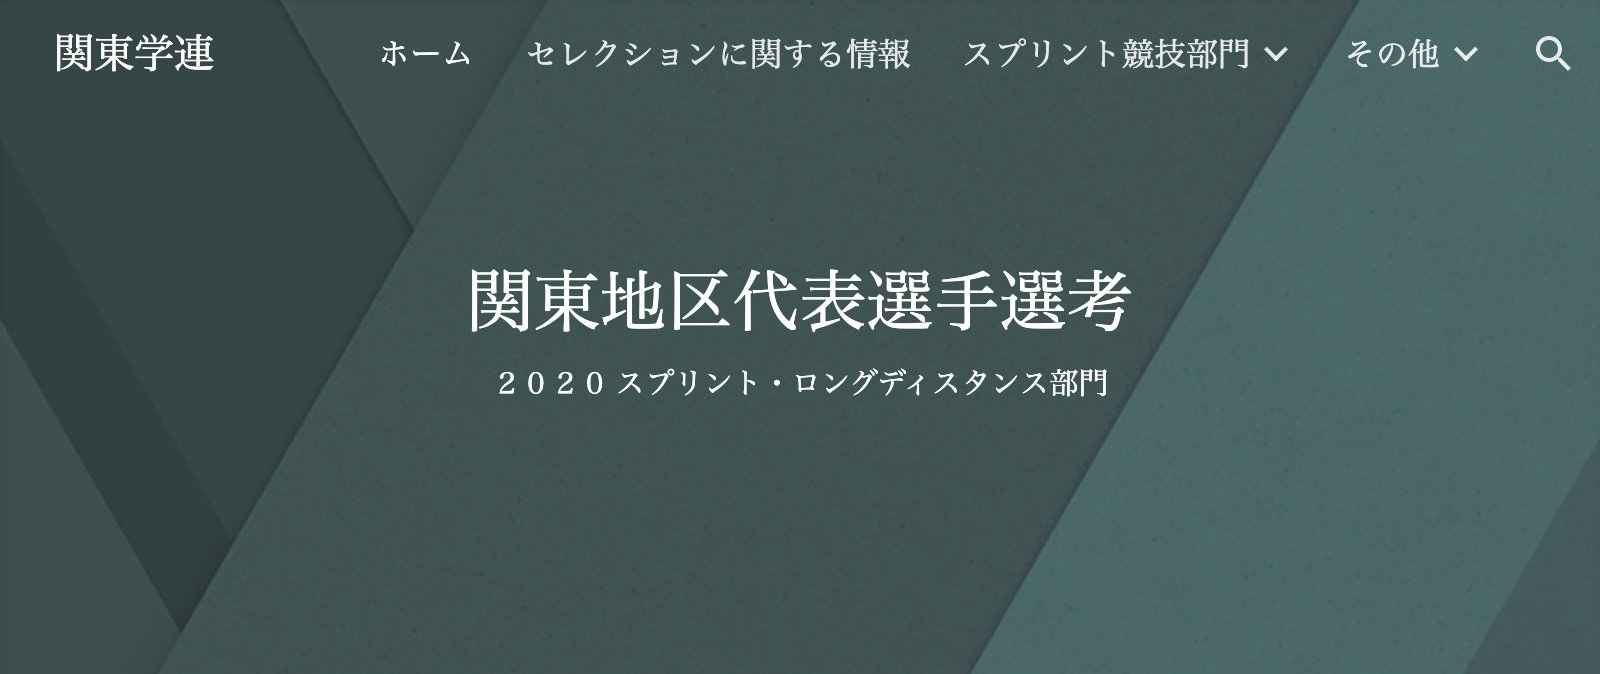 https://sites.google.com/view/icsl2020-kanto-selection/home